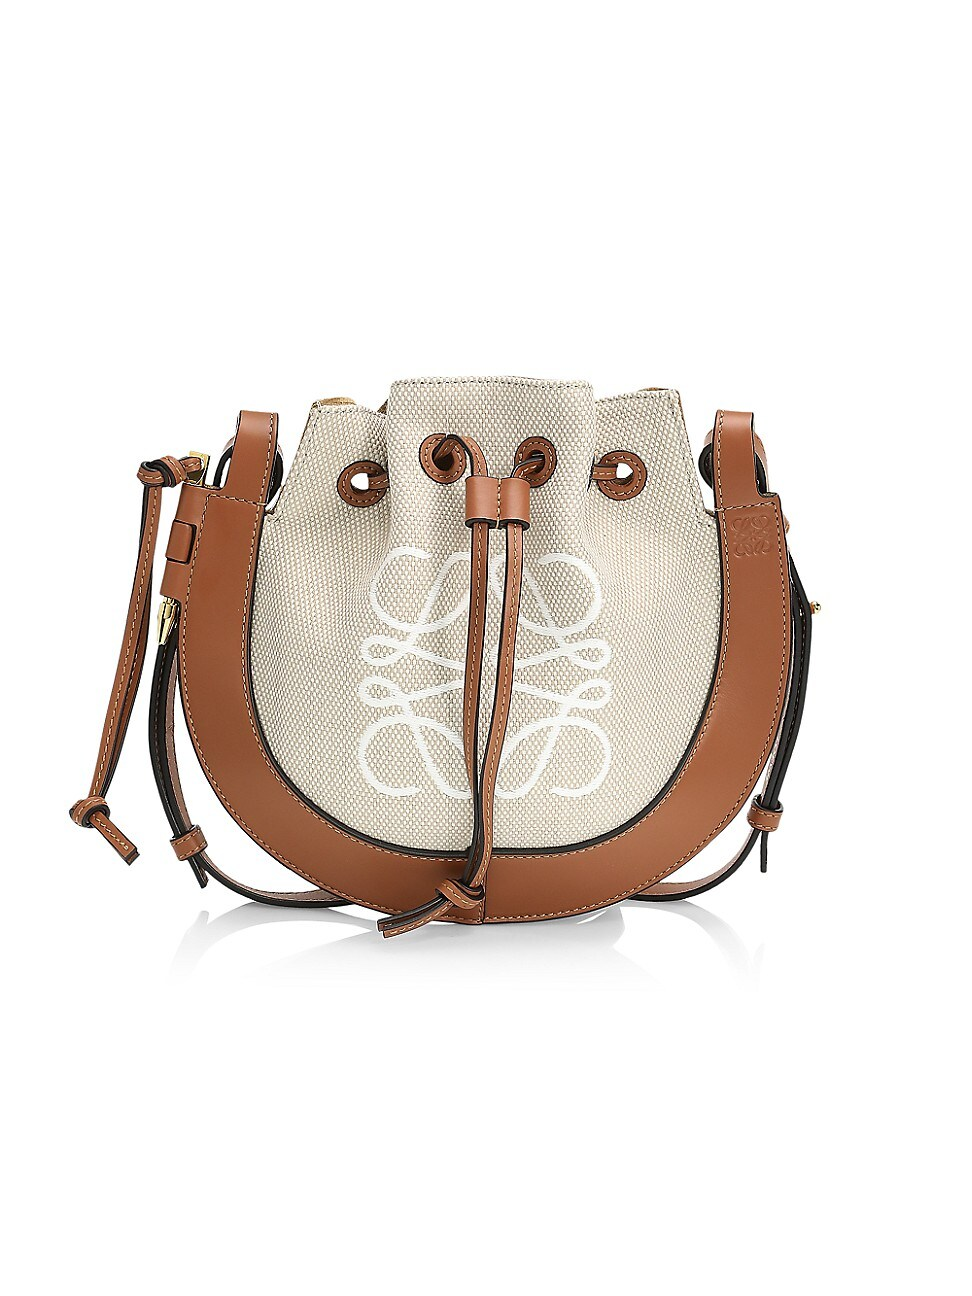 Loewe Women's Small Horseshoe Anagram Leather Bag In Brown